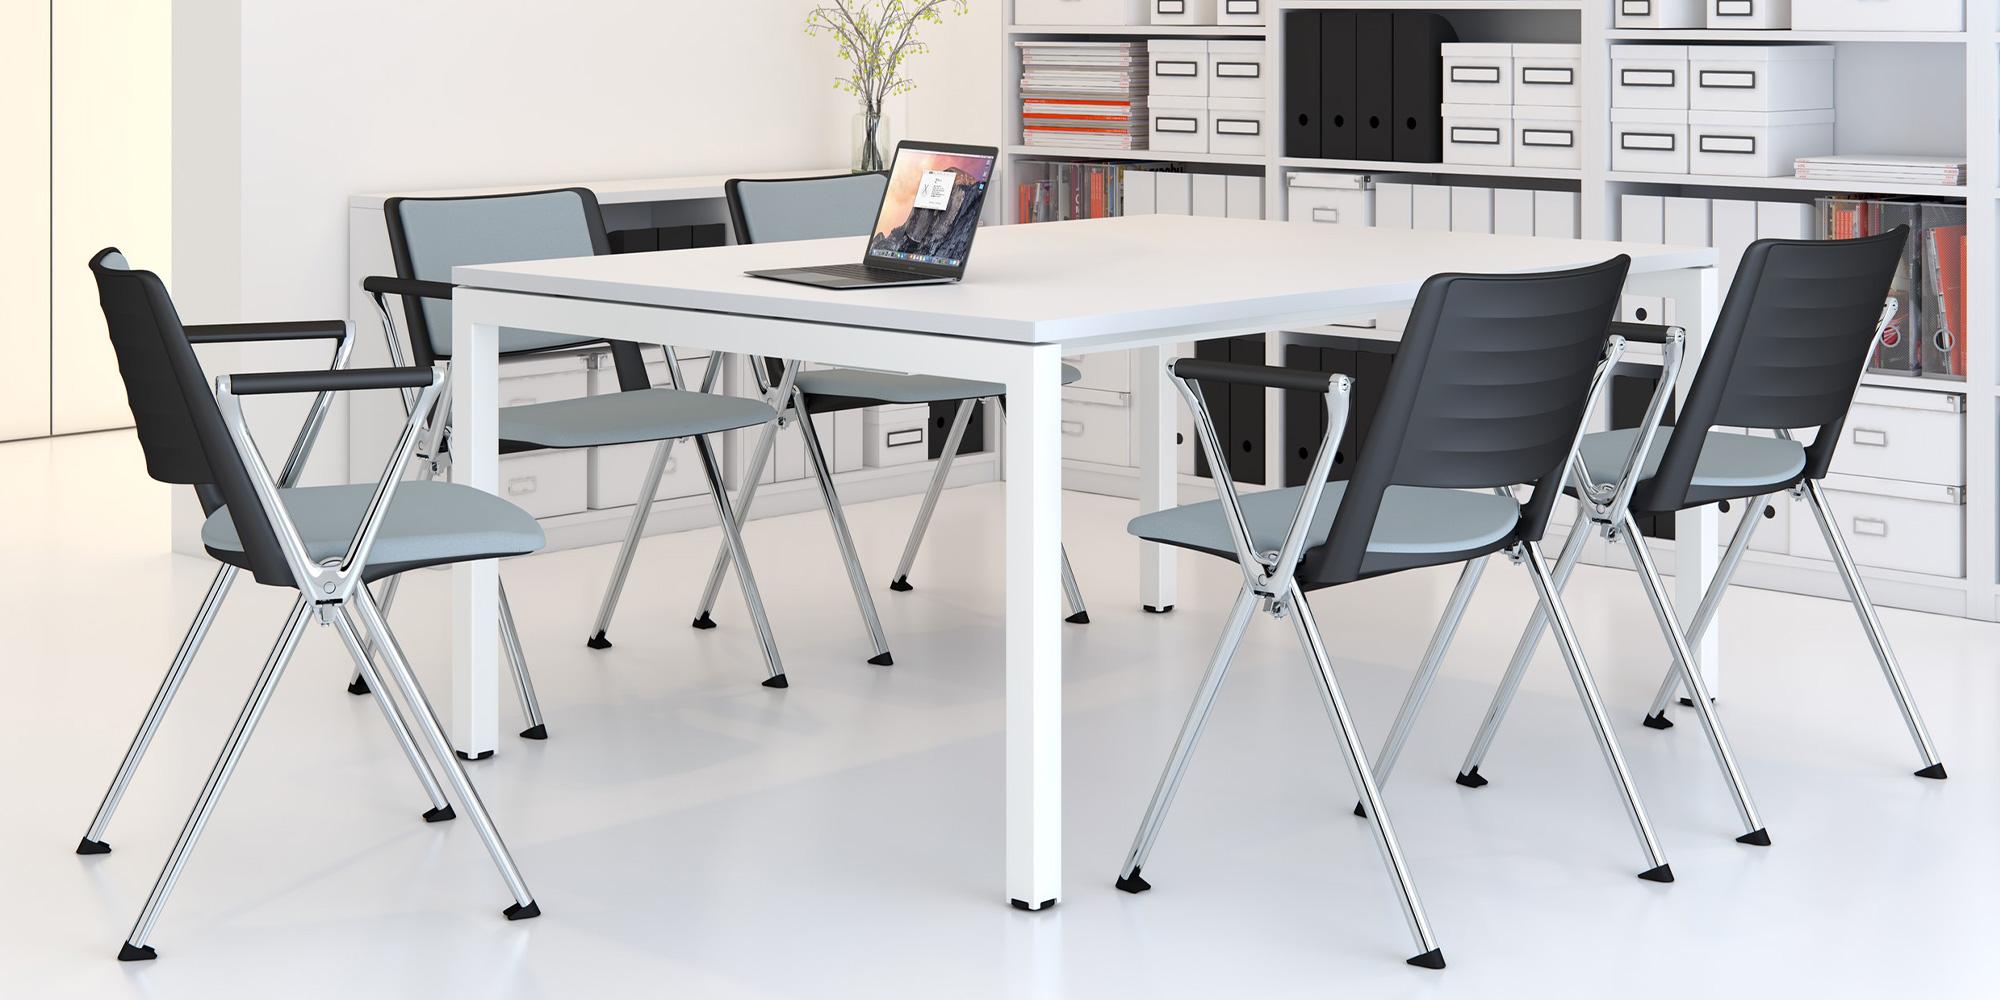 Salto Multi-Purpose Seating Roomset